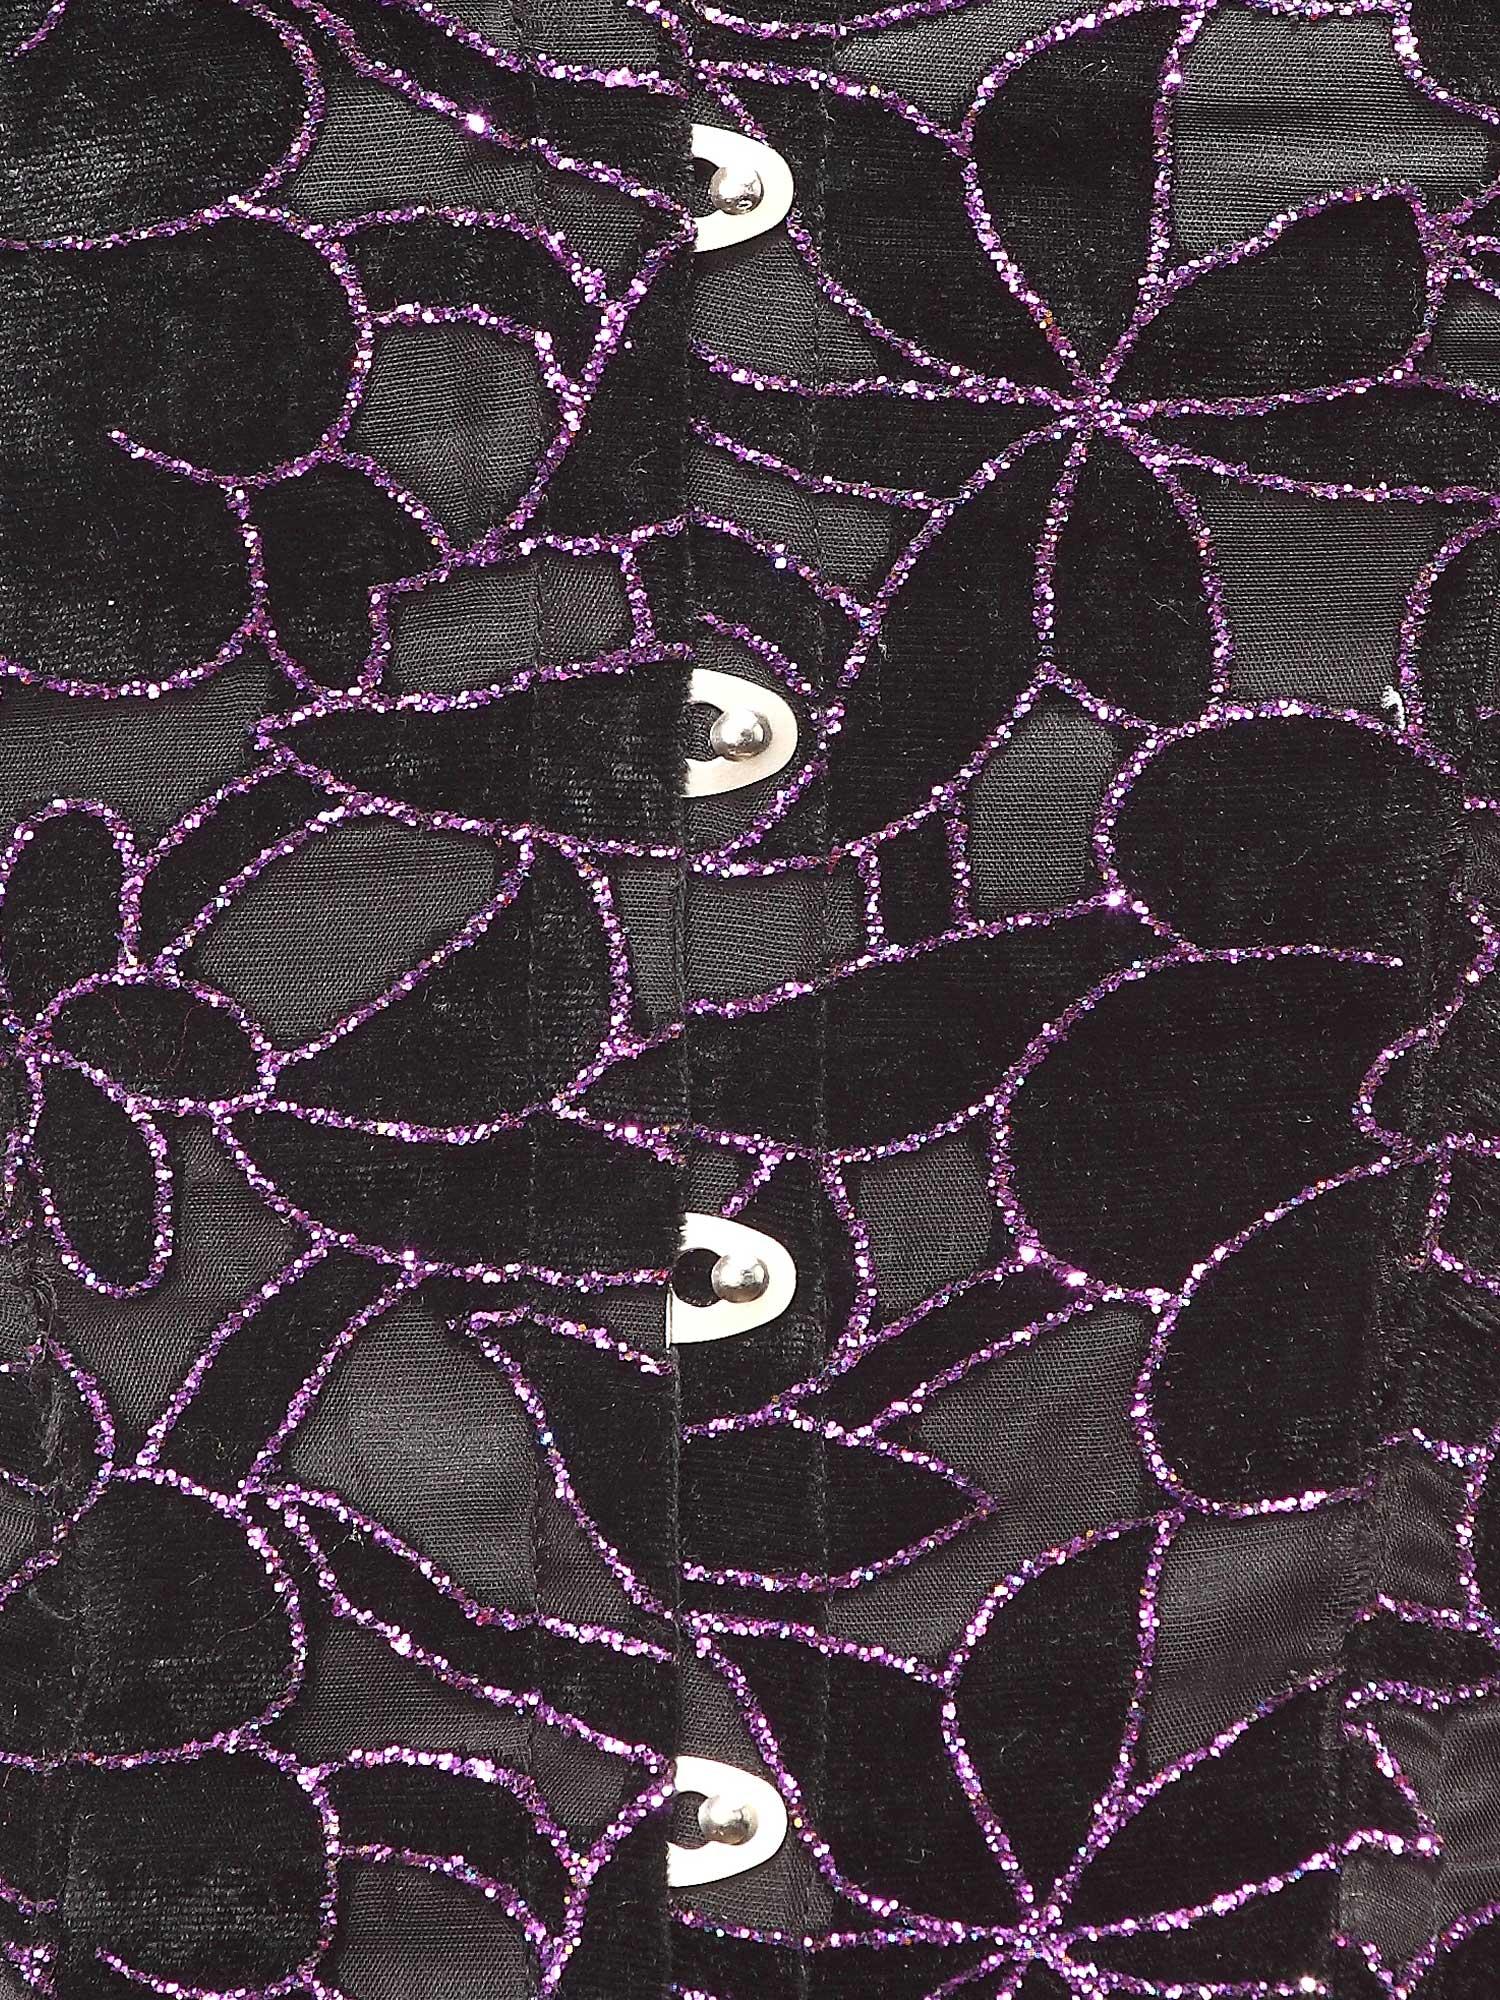 black_floral_fabric_cutwork_steel_boning_corset_waist_cincher_bustier_bustiers_and_corsets_2.jpg